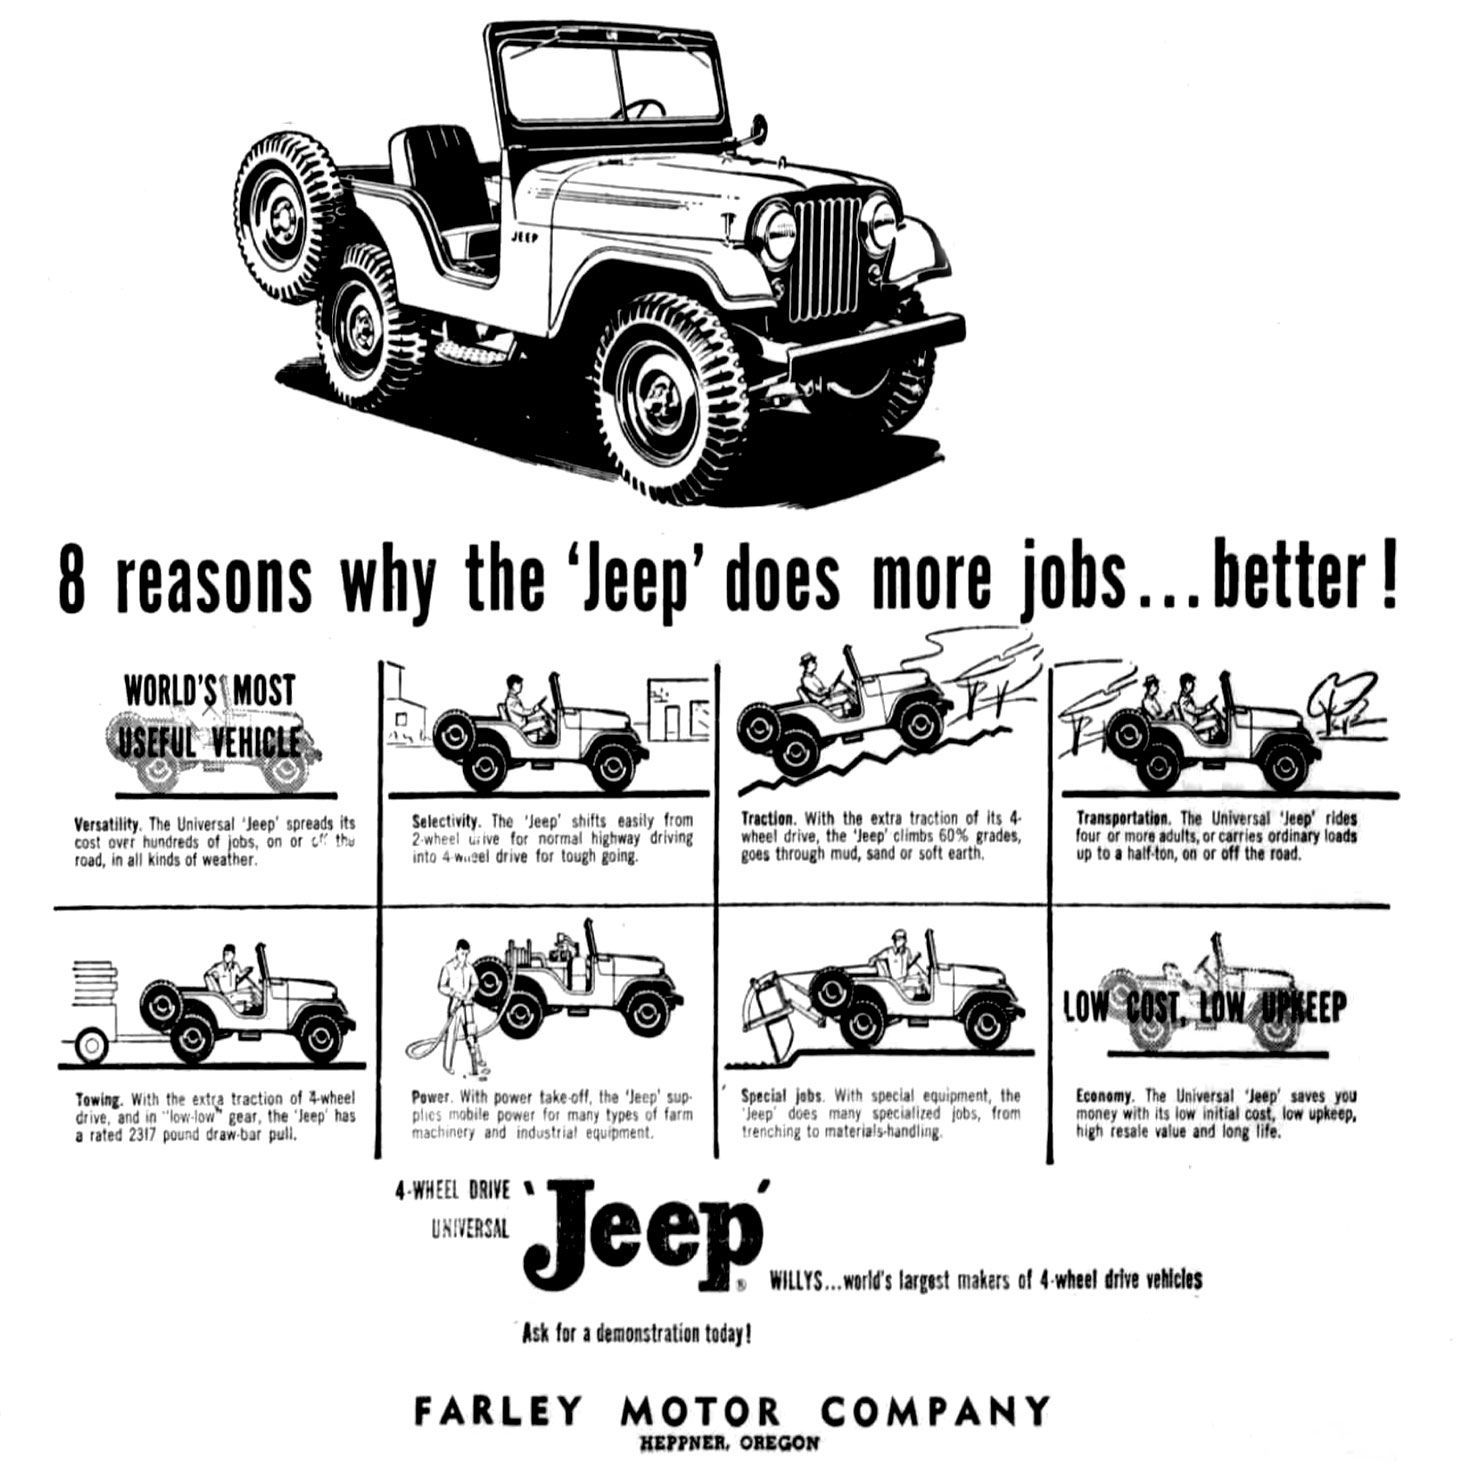 1956 03 15 Heppner Gazette Times Cj5 Universal Jeep Ad Lores